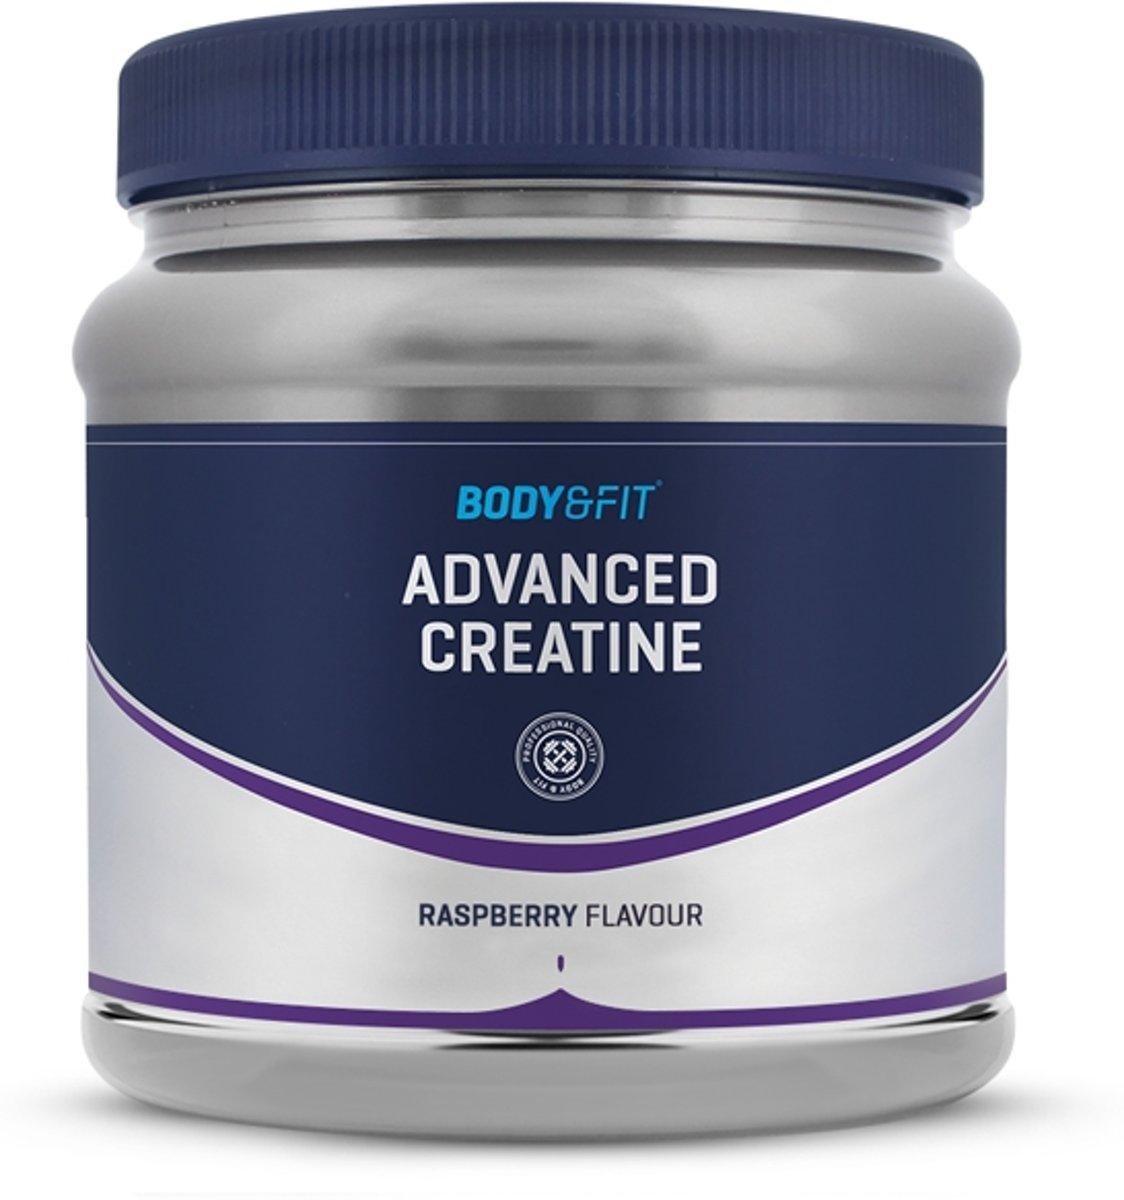 Body & Fit Advanced Creatine - 300 gram - Raspberry kopen